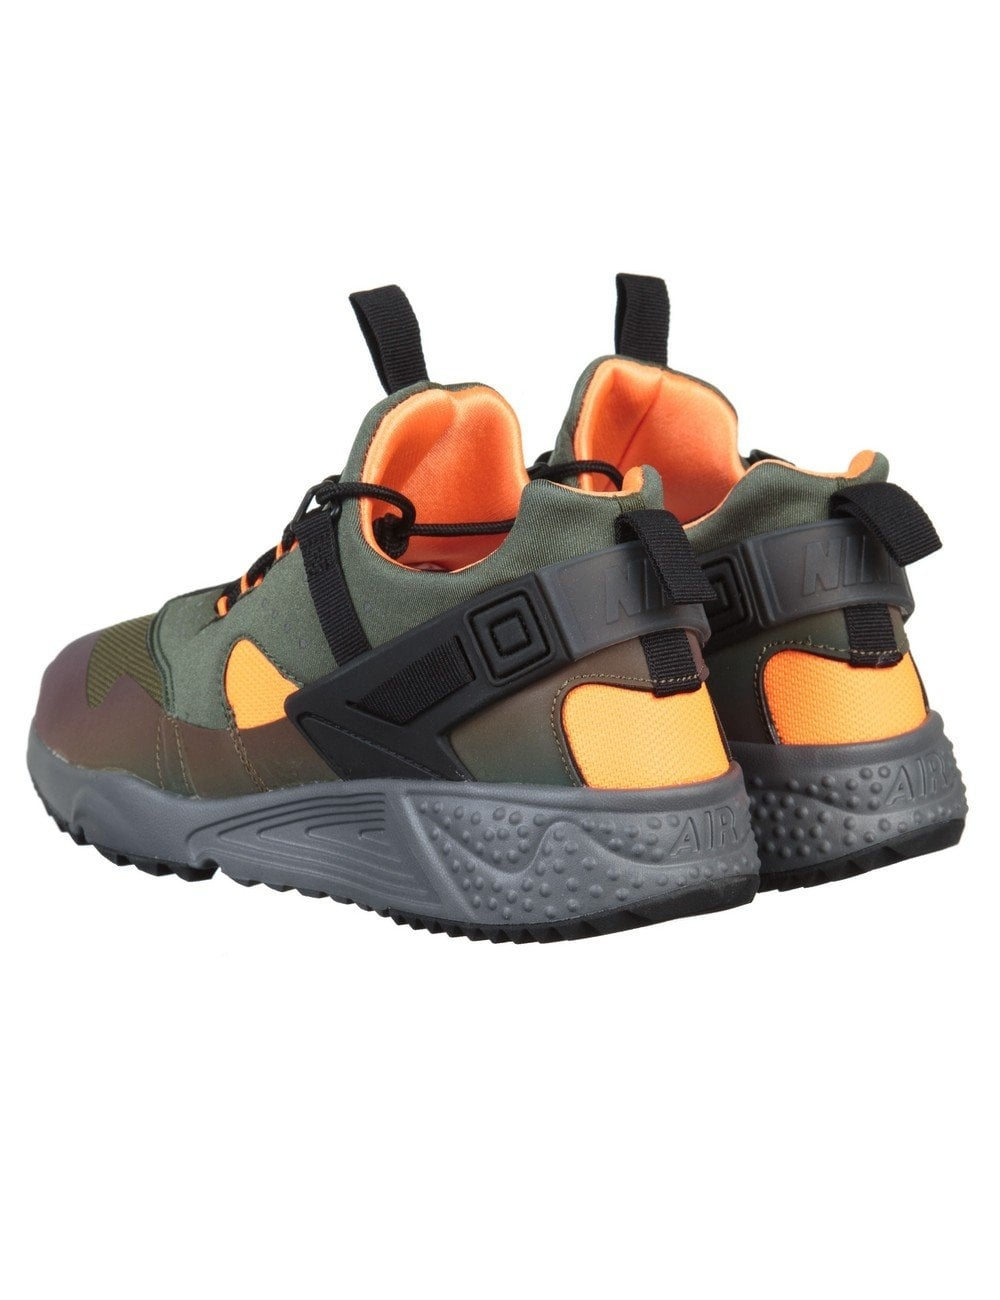 pantalon de travail timberland - Nike Air Huarache Utility Premium Shoes - Carbon Green/Black ...